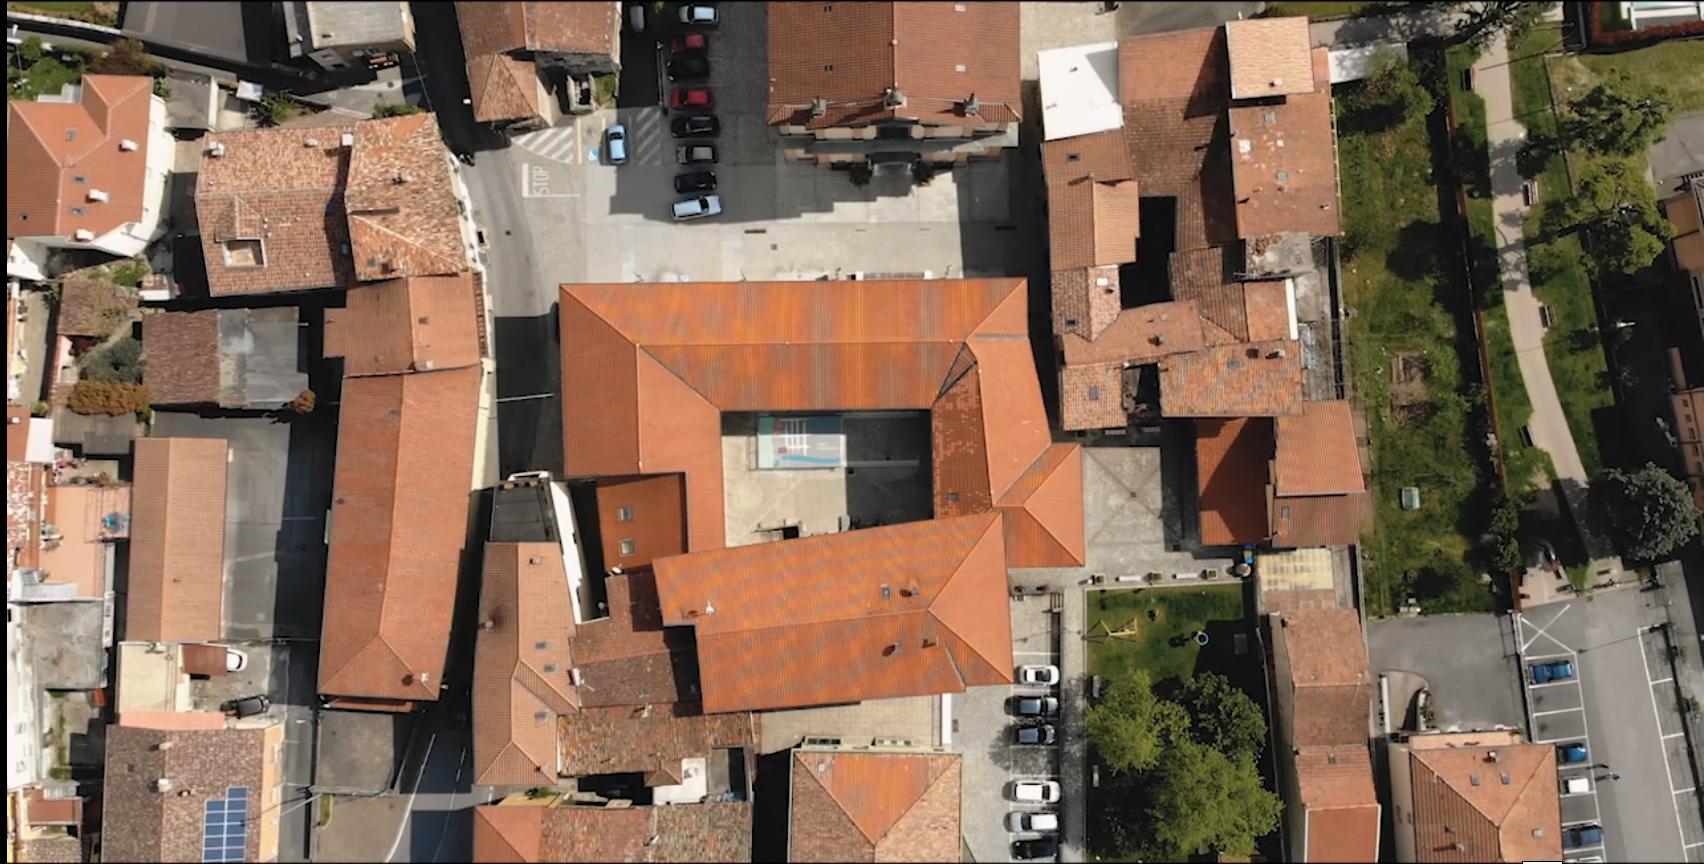 cividate-camuno_archeologico_veduta-da-drone_foto-drm-lombardia